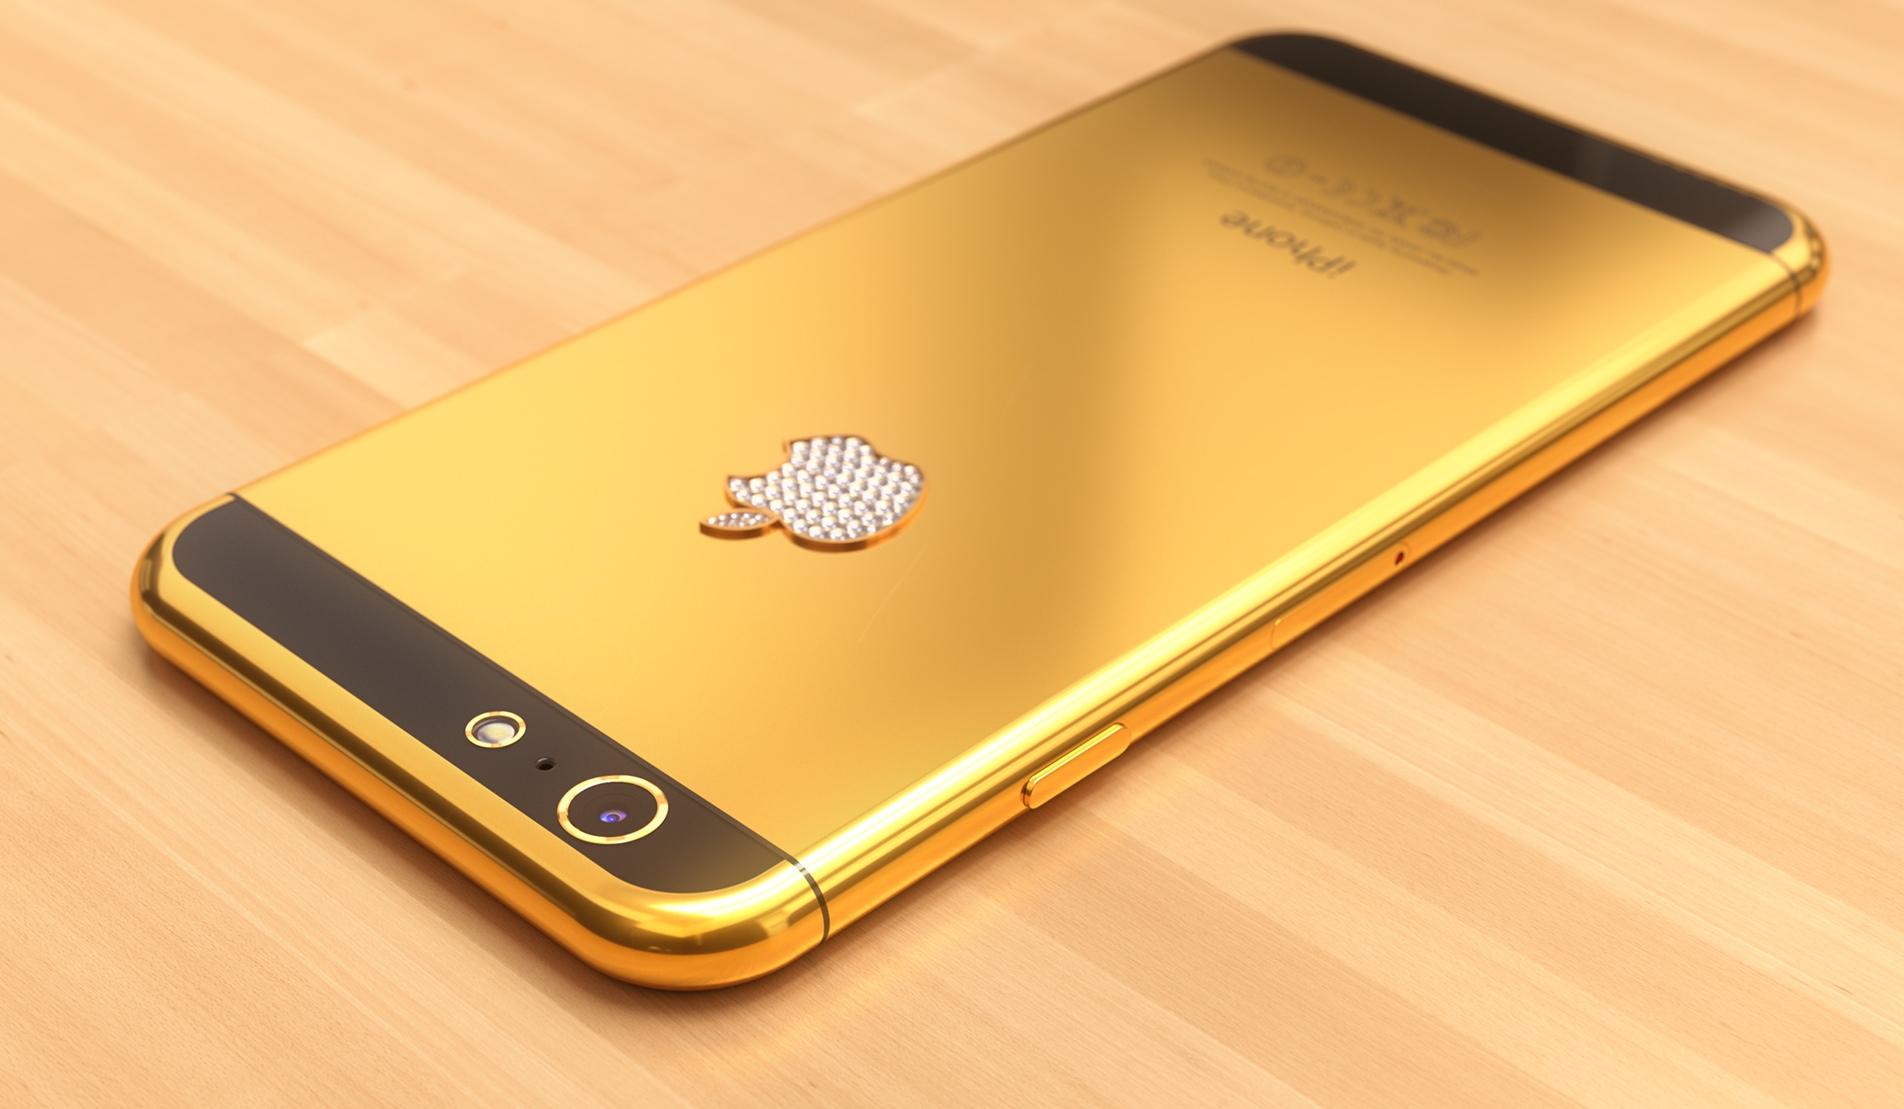 iPhone 6 concept (gold, Martin Hajek 001)